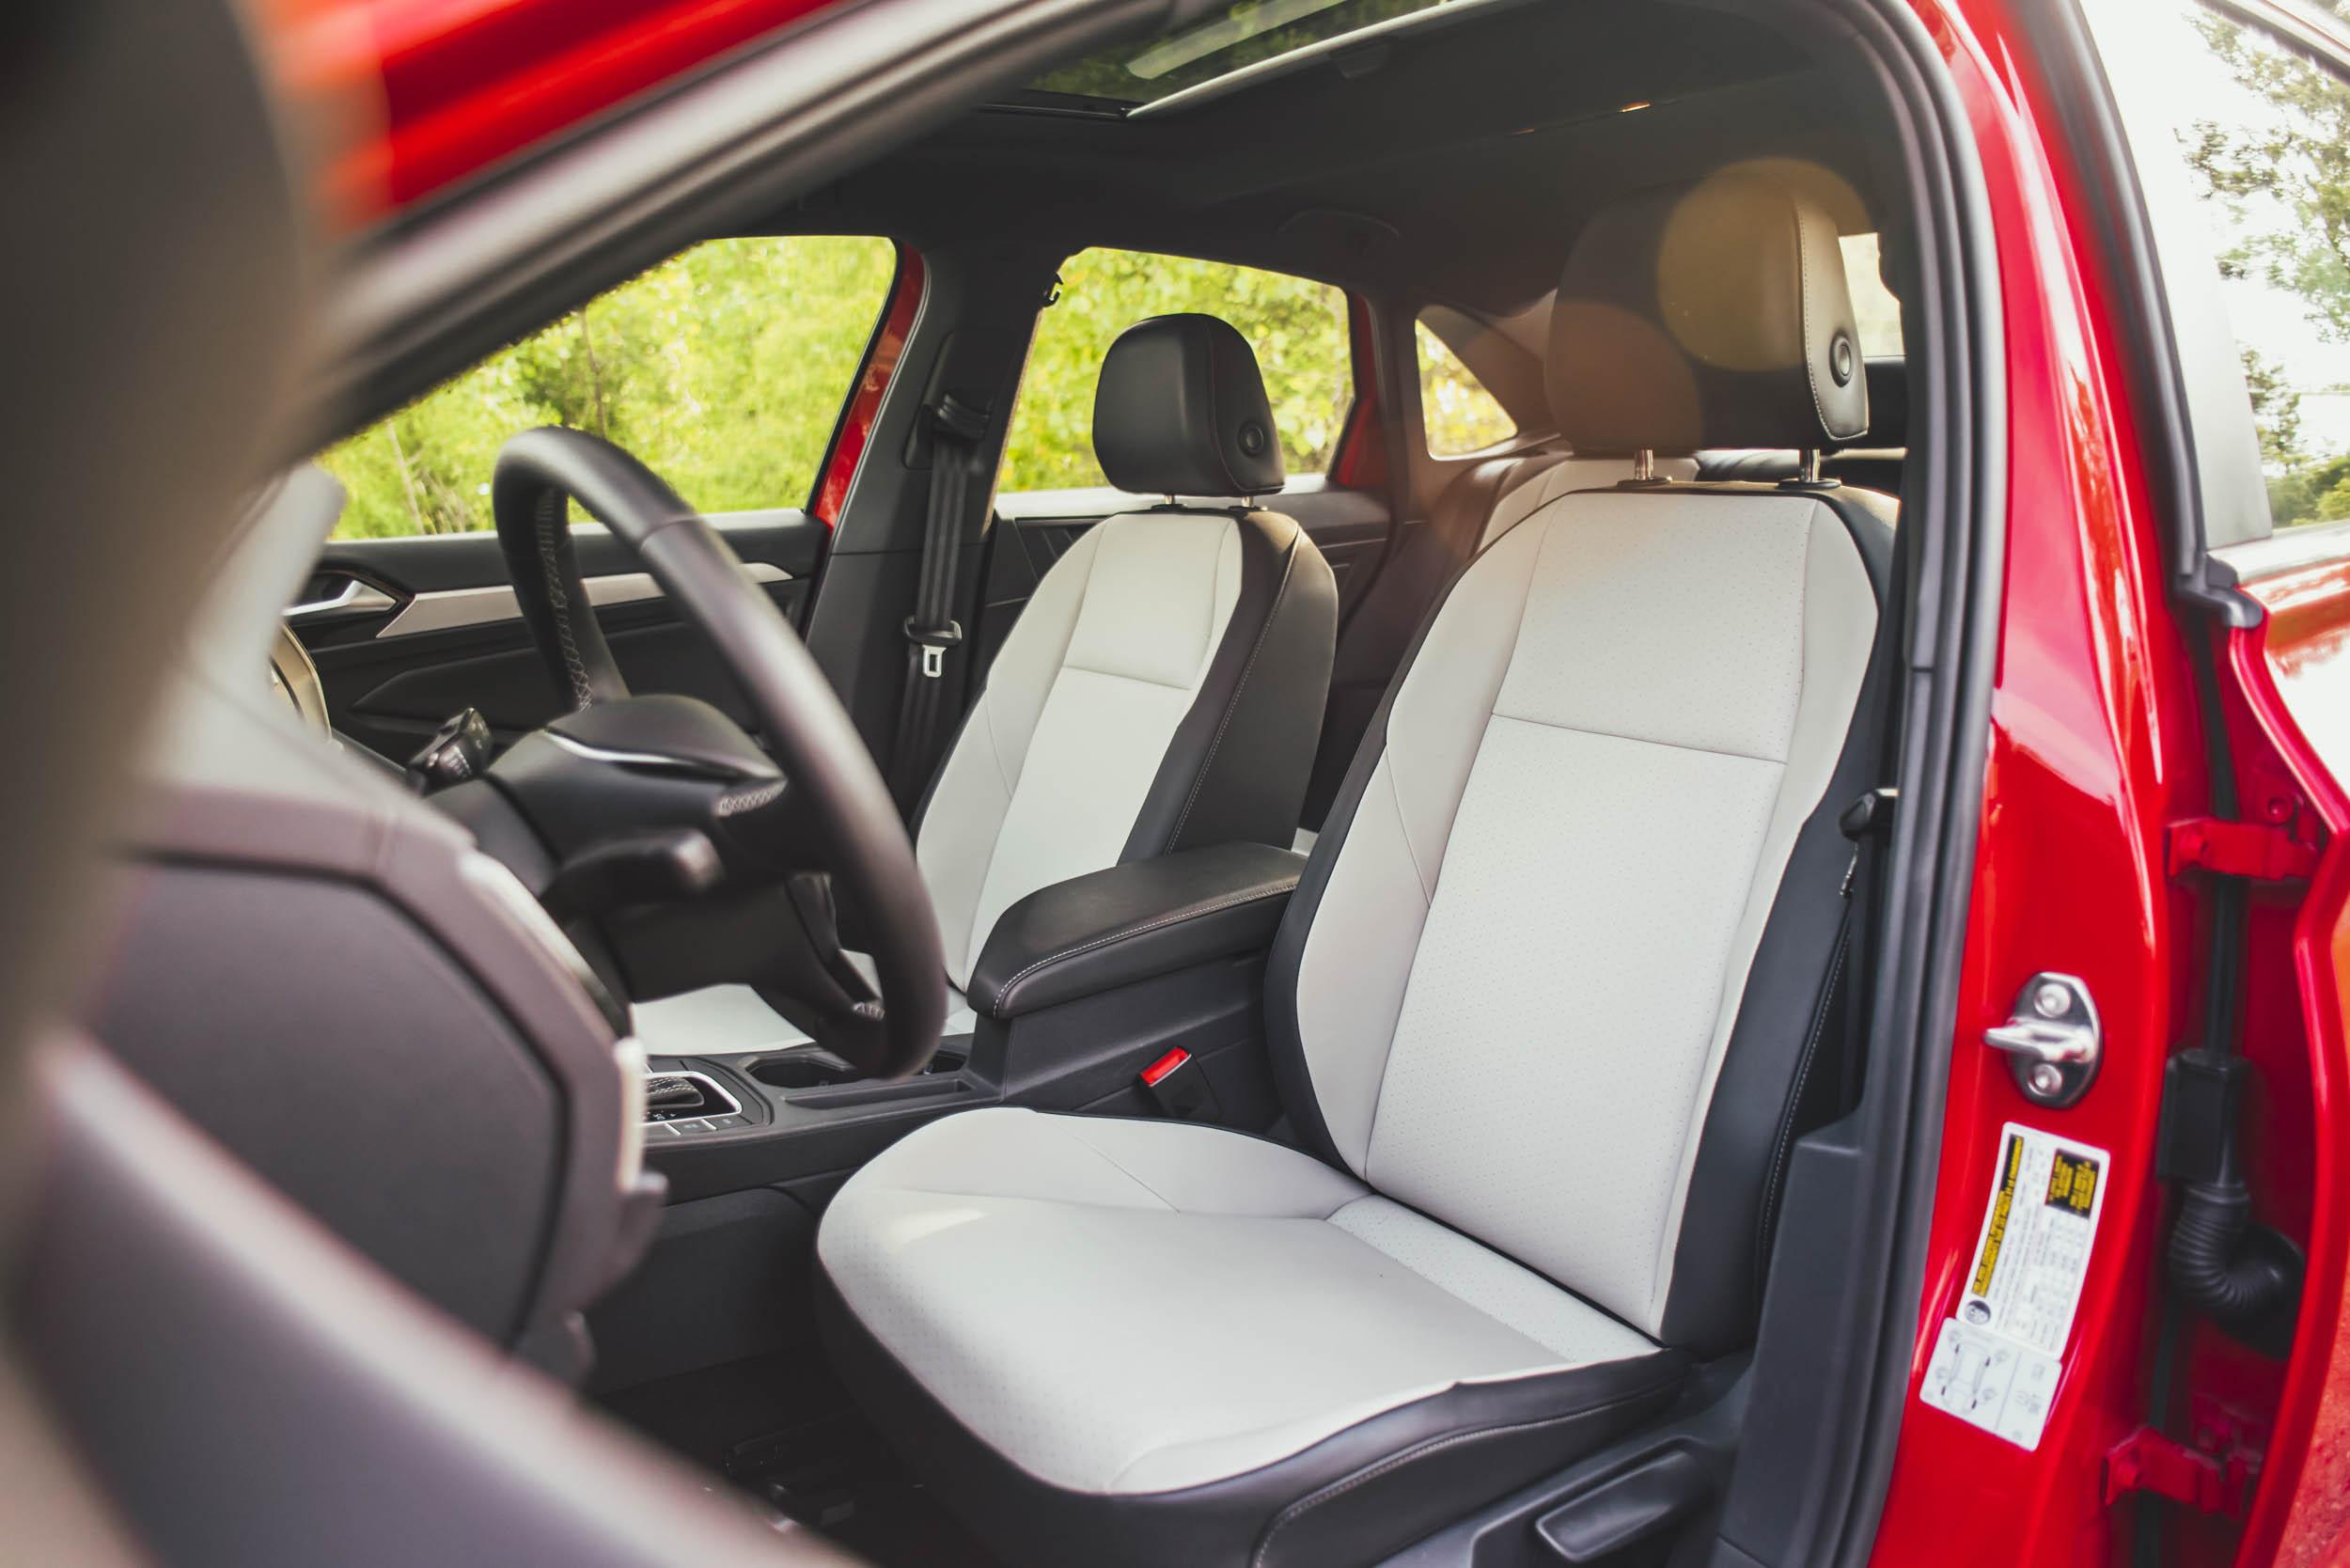 volkswagen jetta r-line seats and interior